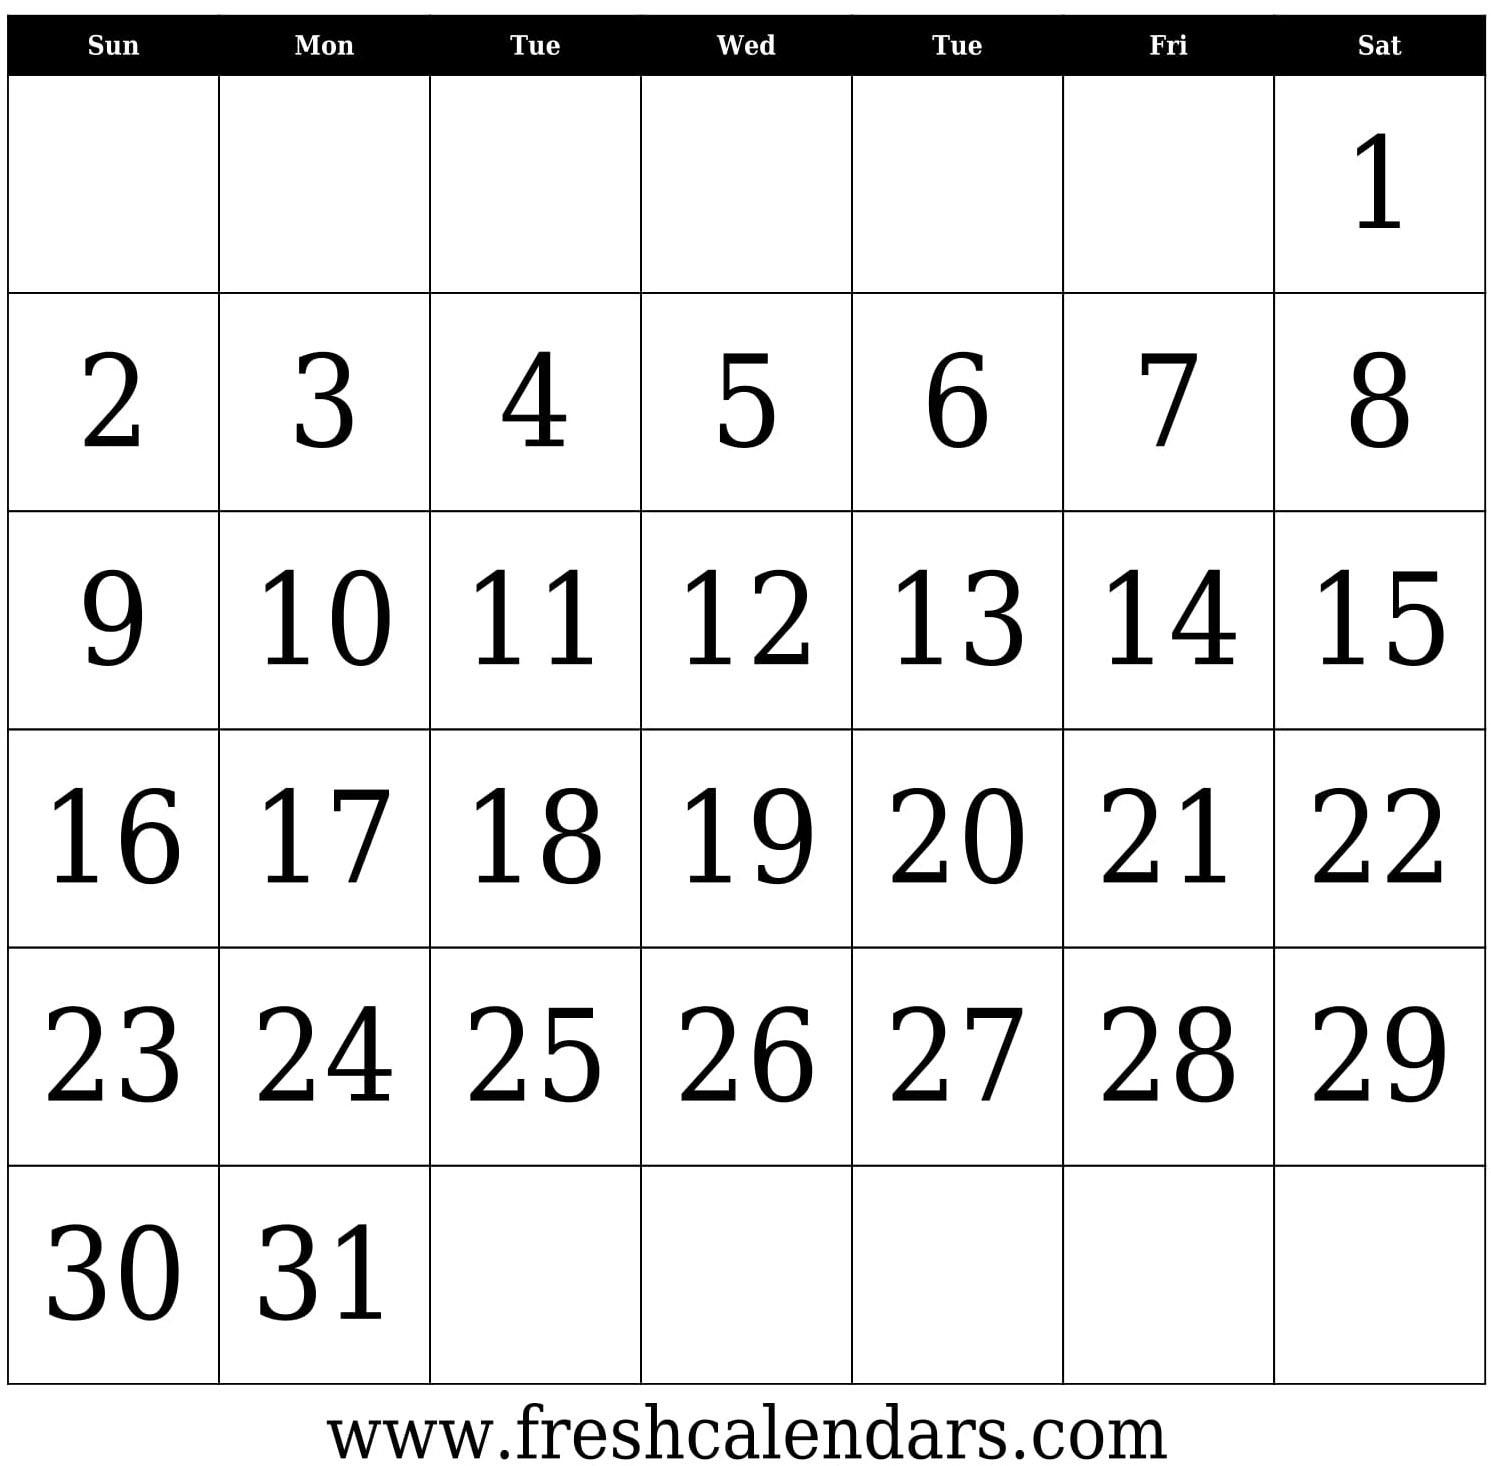 Blank Calendar: Wonderfully Printable 2019 Templates-A Blank Page Of 31 Days Of A Calendar